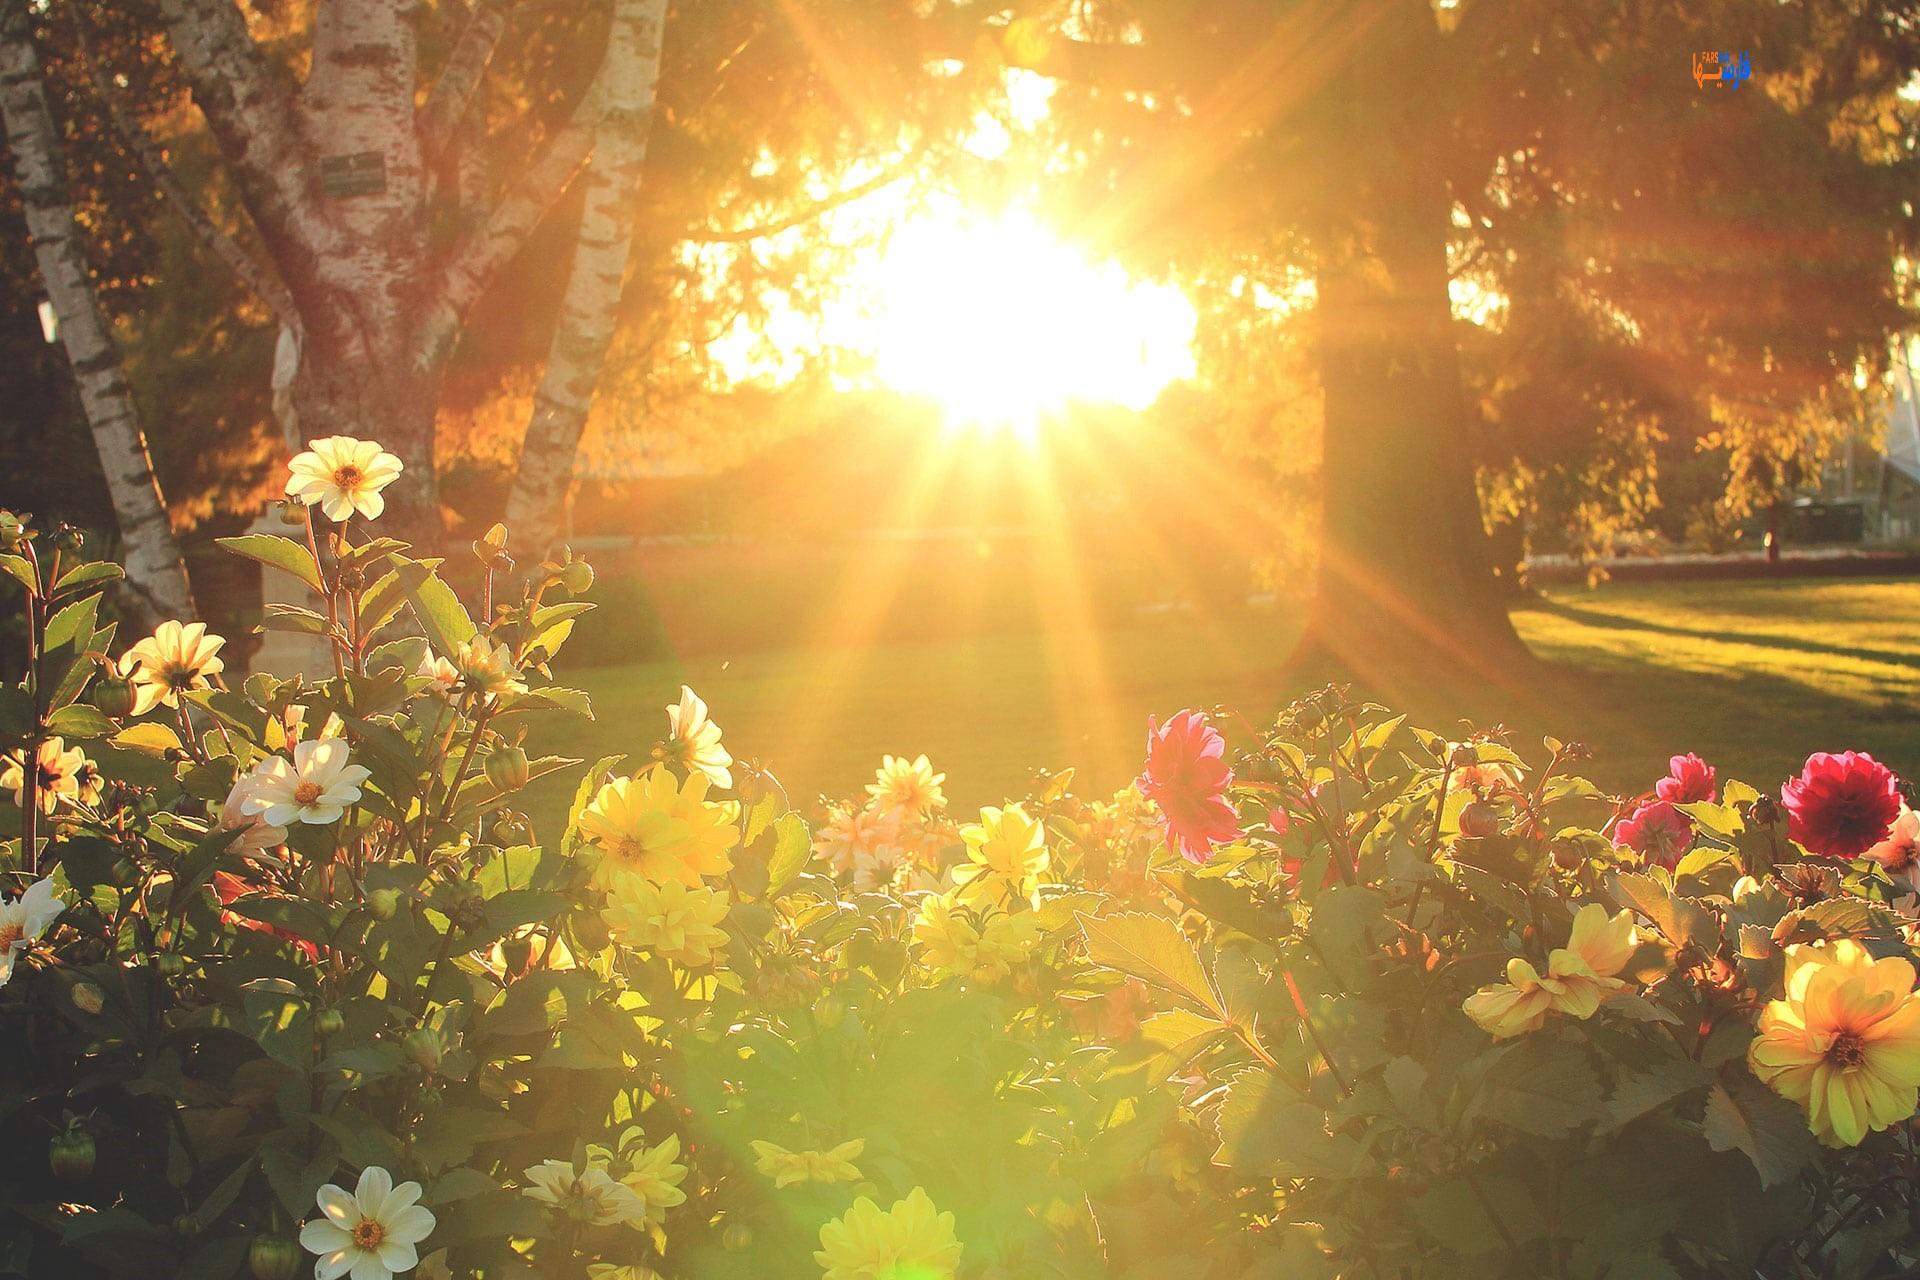 فواید نور خورشید